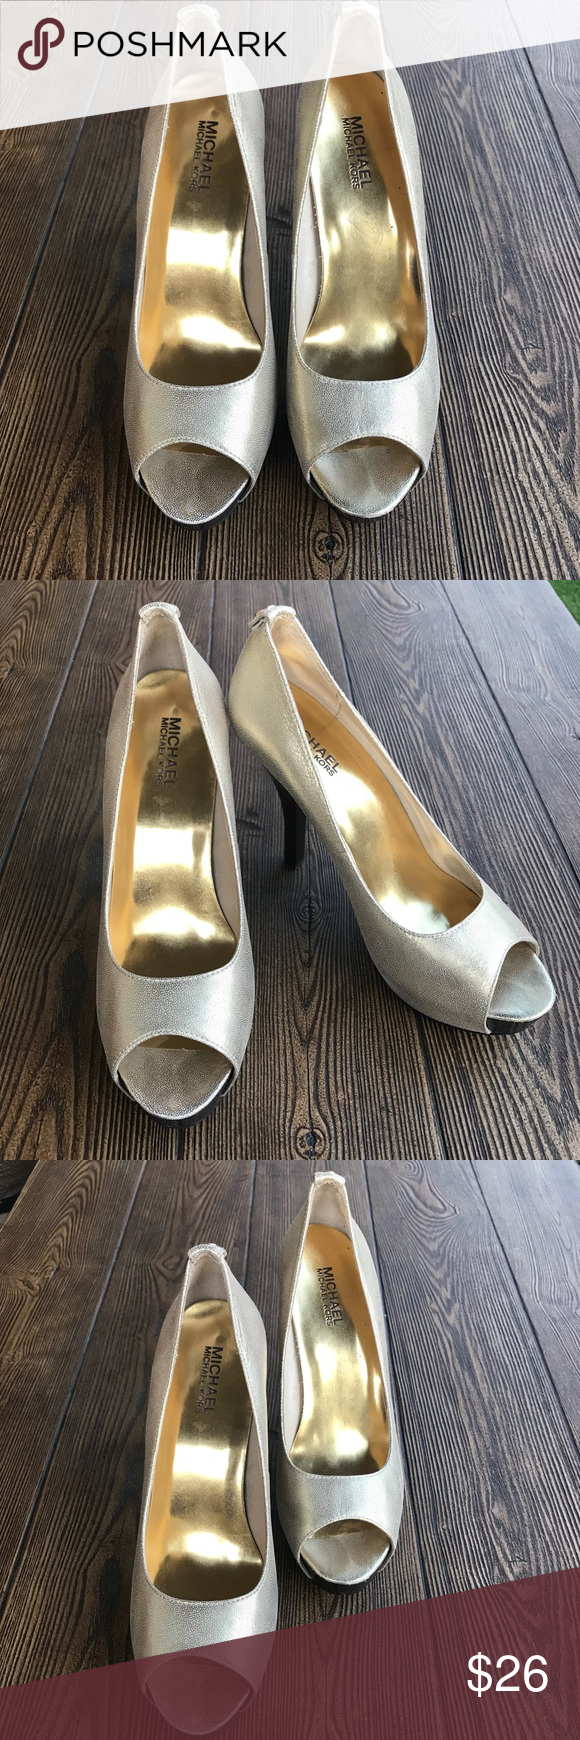 7171bcbdb8a michael kors shoes Used Gold Open Toe High Heels   Beautiful Womens michael  kors shoes 9 Used Gold Open Toe High Heels Authentic.